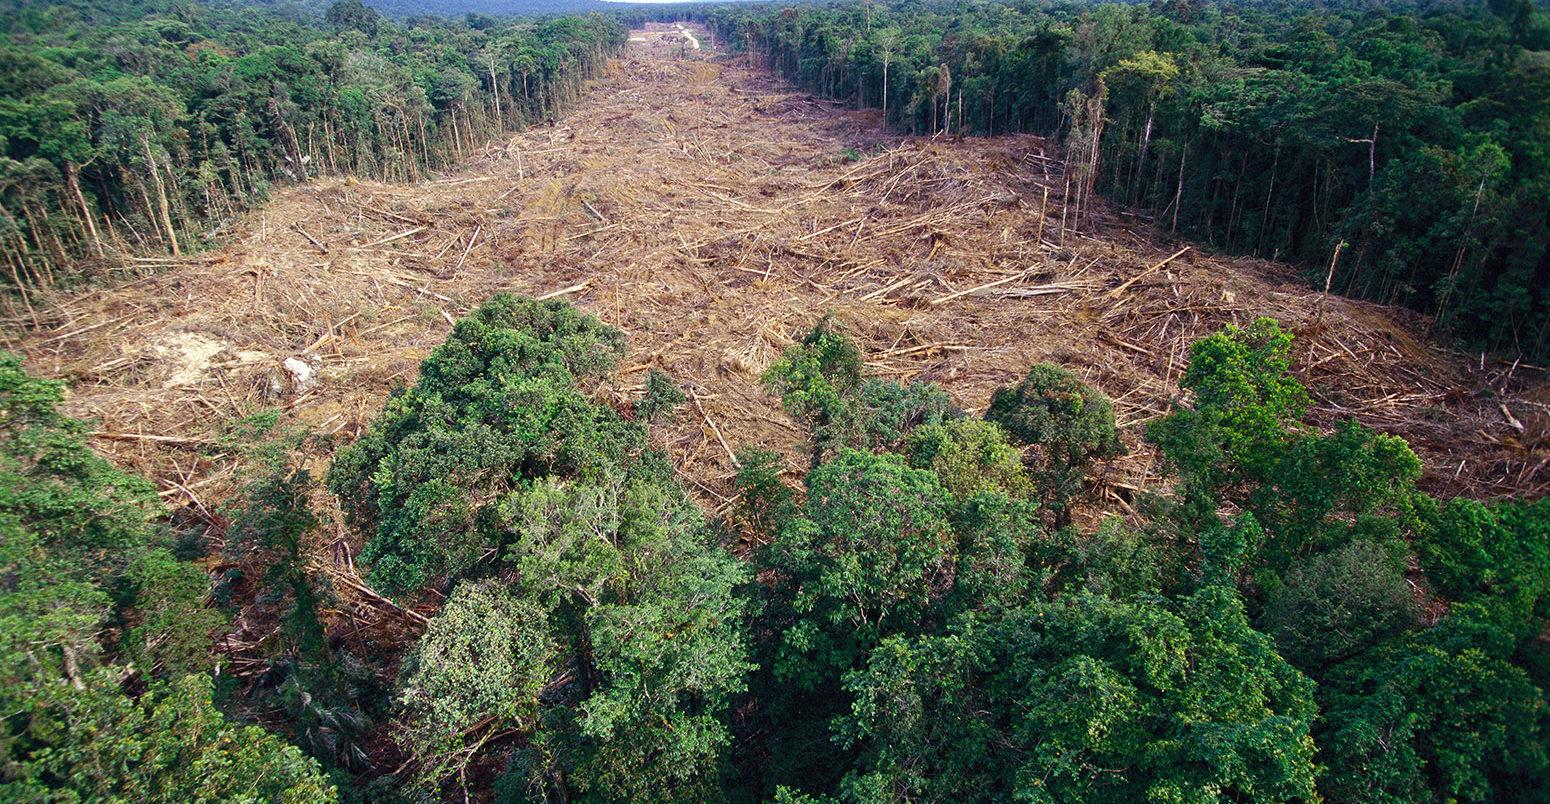 amazon rainforest layers diagram 2002 pt cruiser radio wiring deforestation has driven up hottest day temperatures